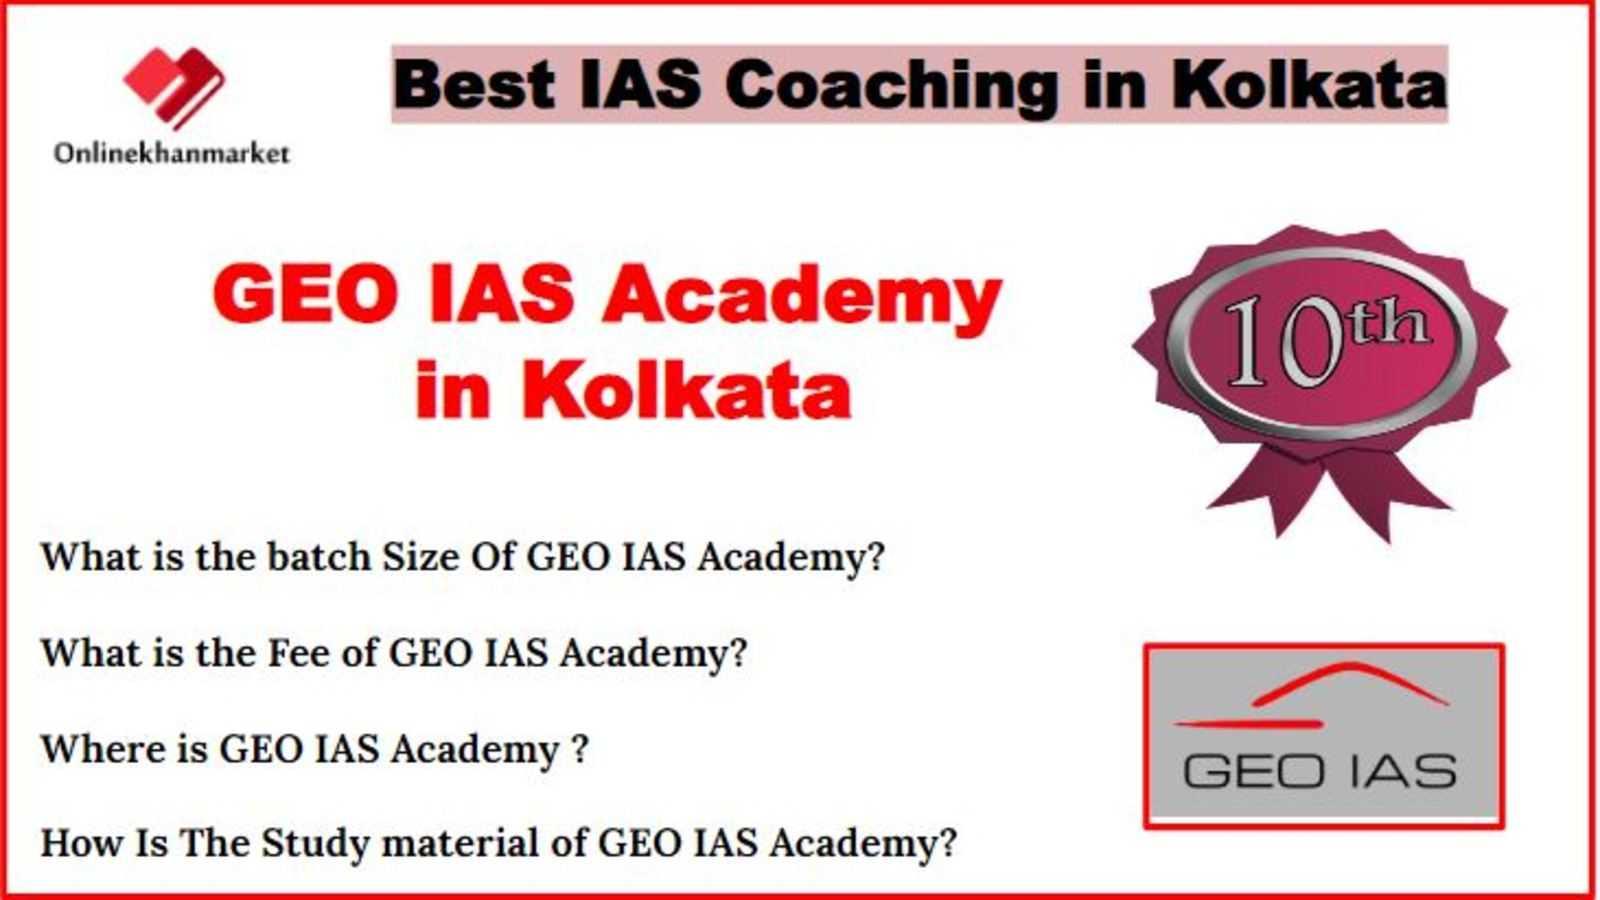 IAS Coaching in Kolkata